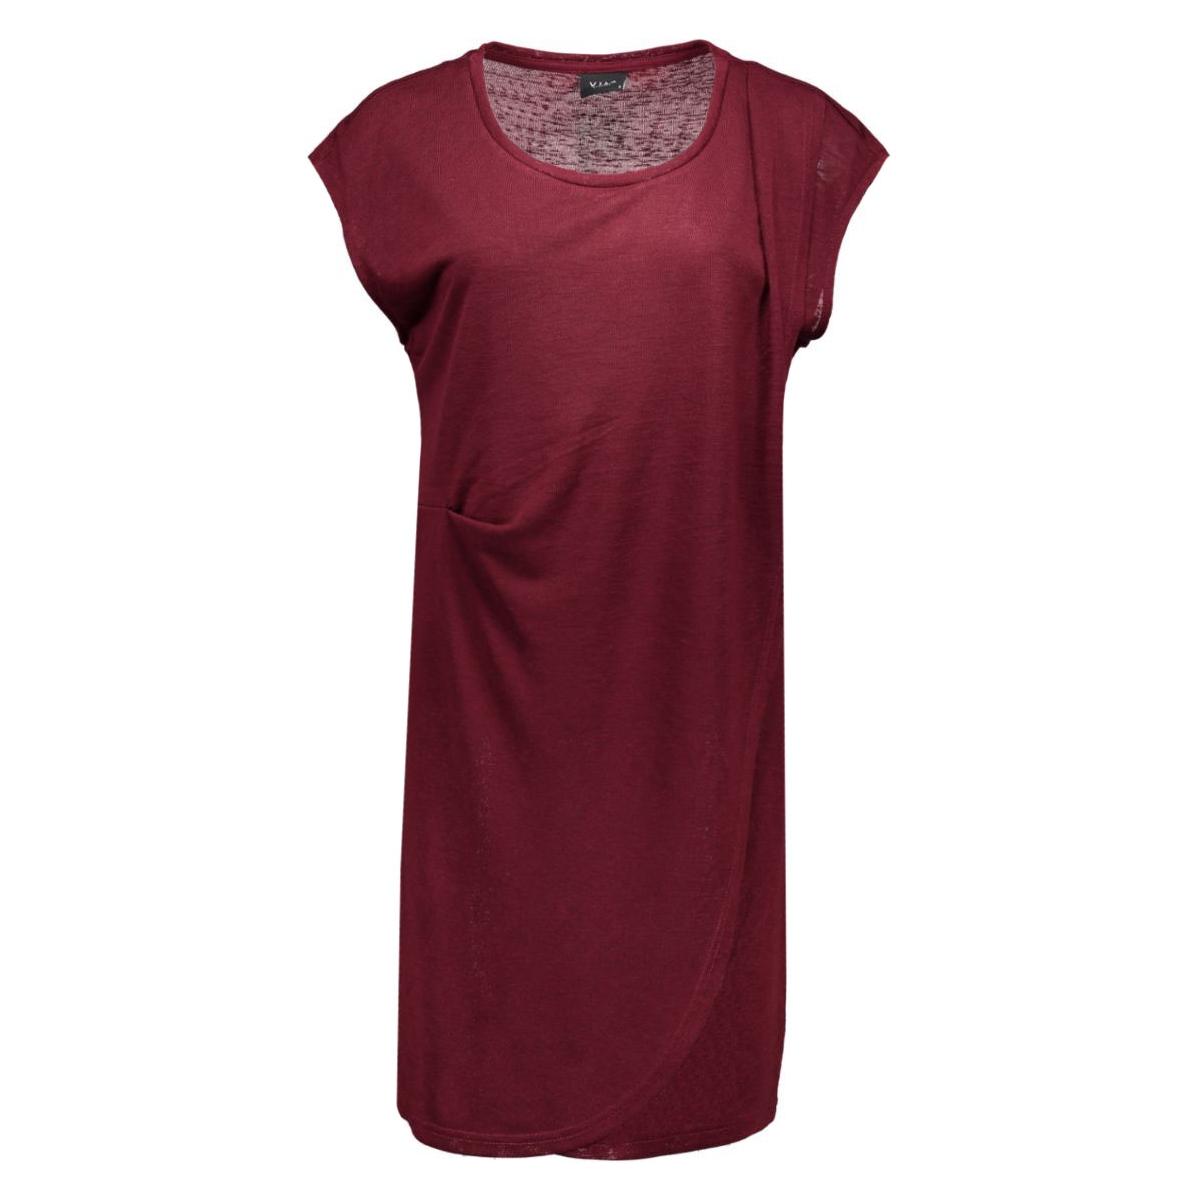 visumina s/s dress gv 14036903 vila jurk tawny port